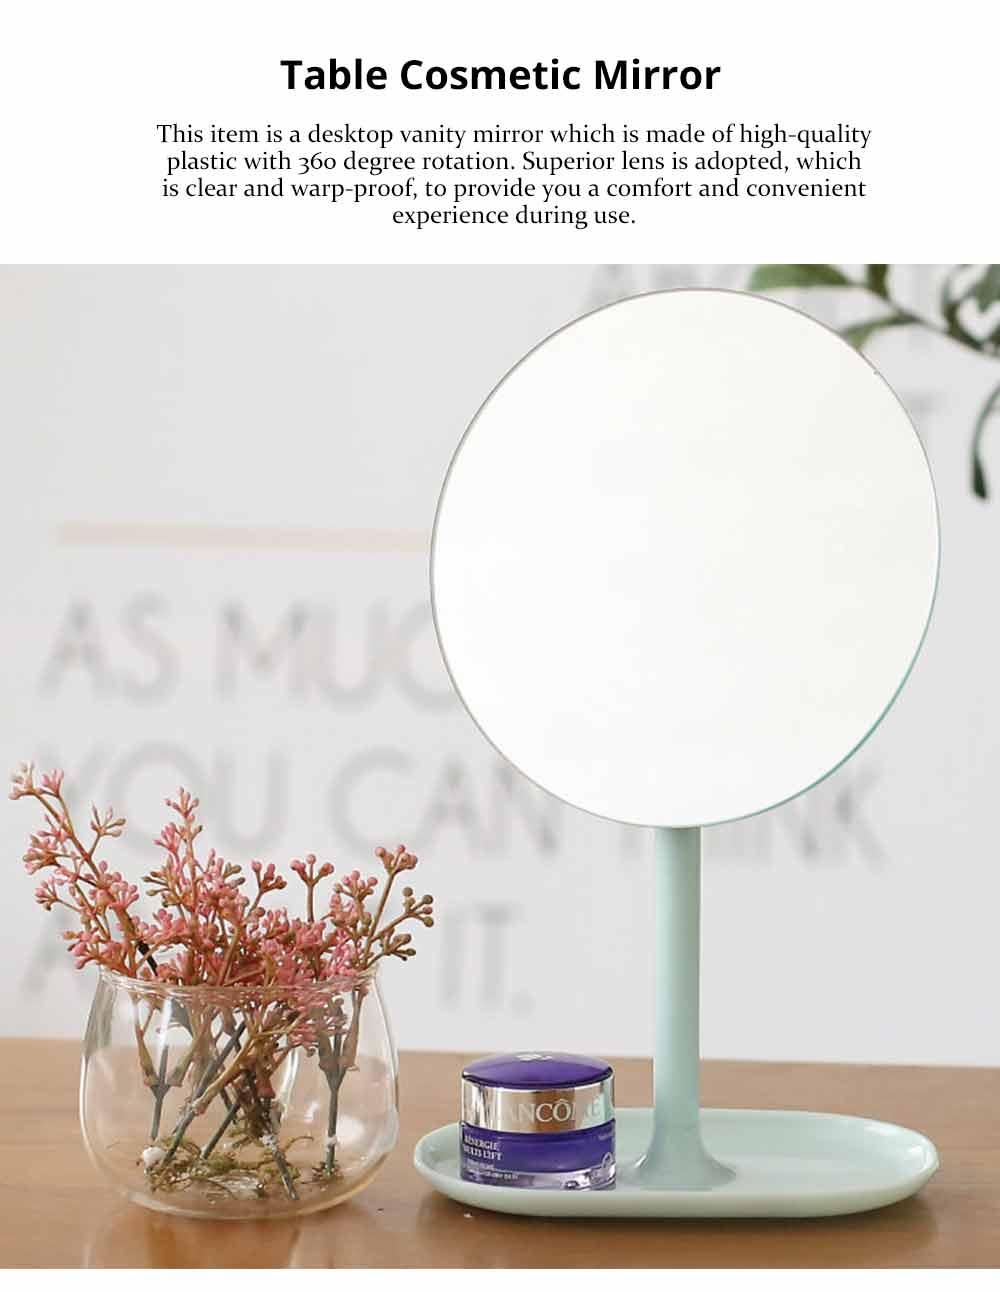 Table Top Vanity Mirror - Table Cosmetic Mirror For Vanity, One-Sided Round Cosmetic Mirror For Makeup 0